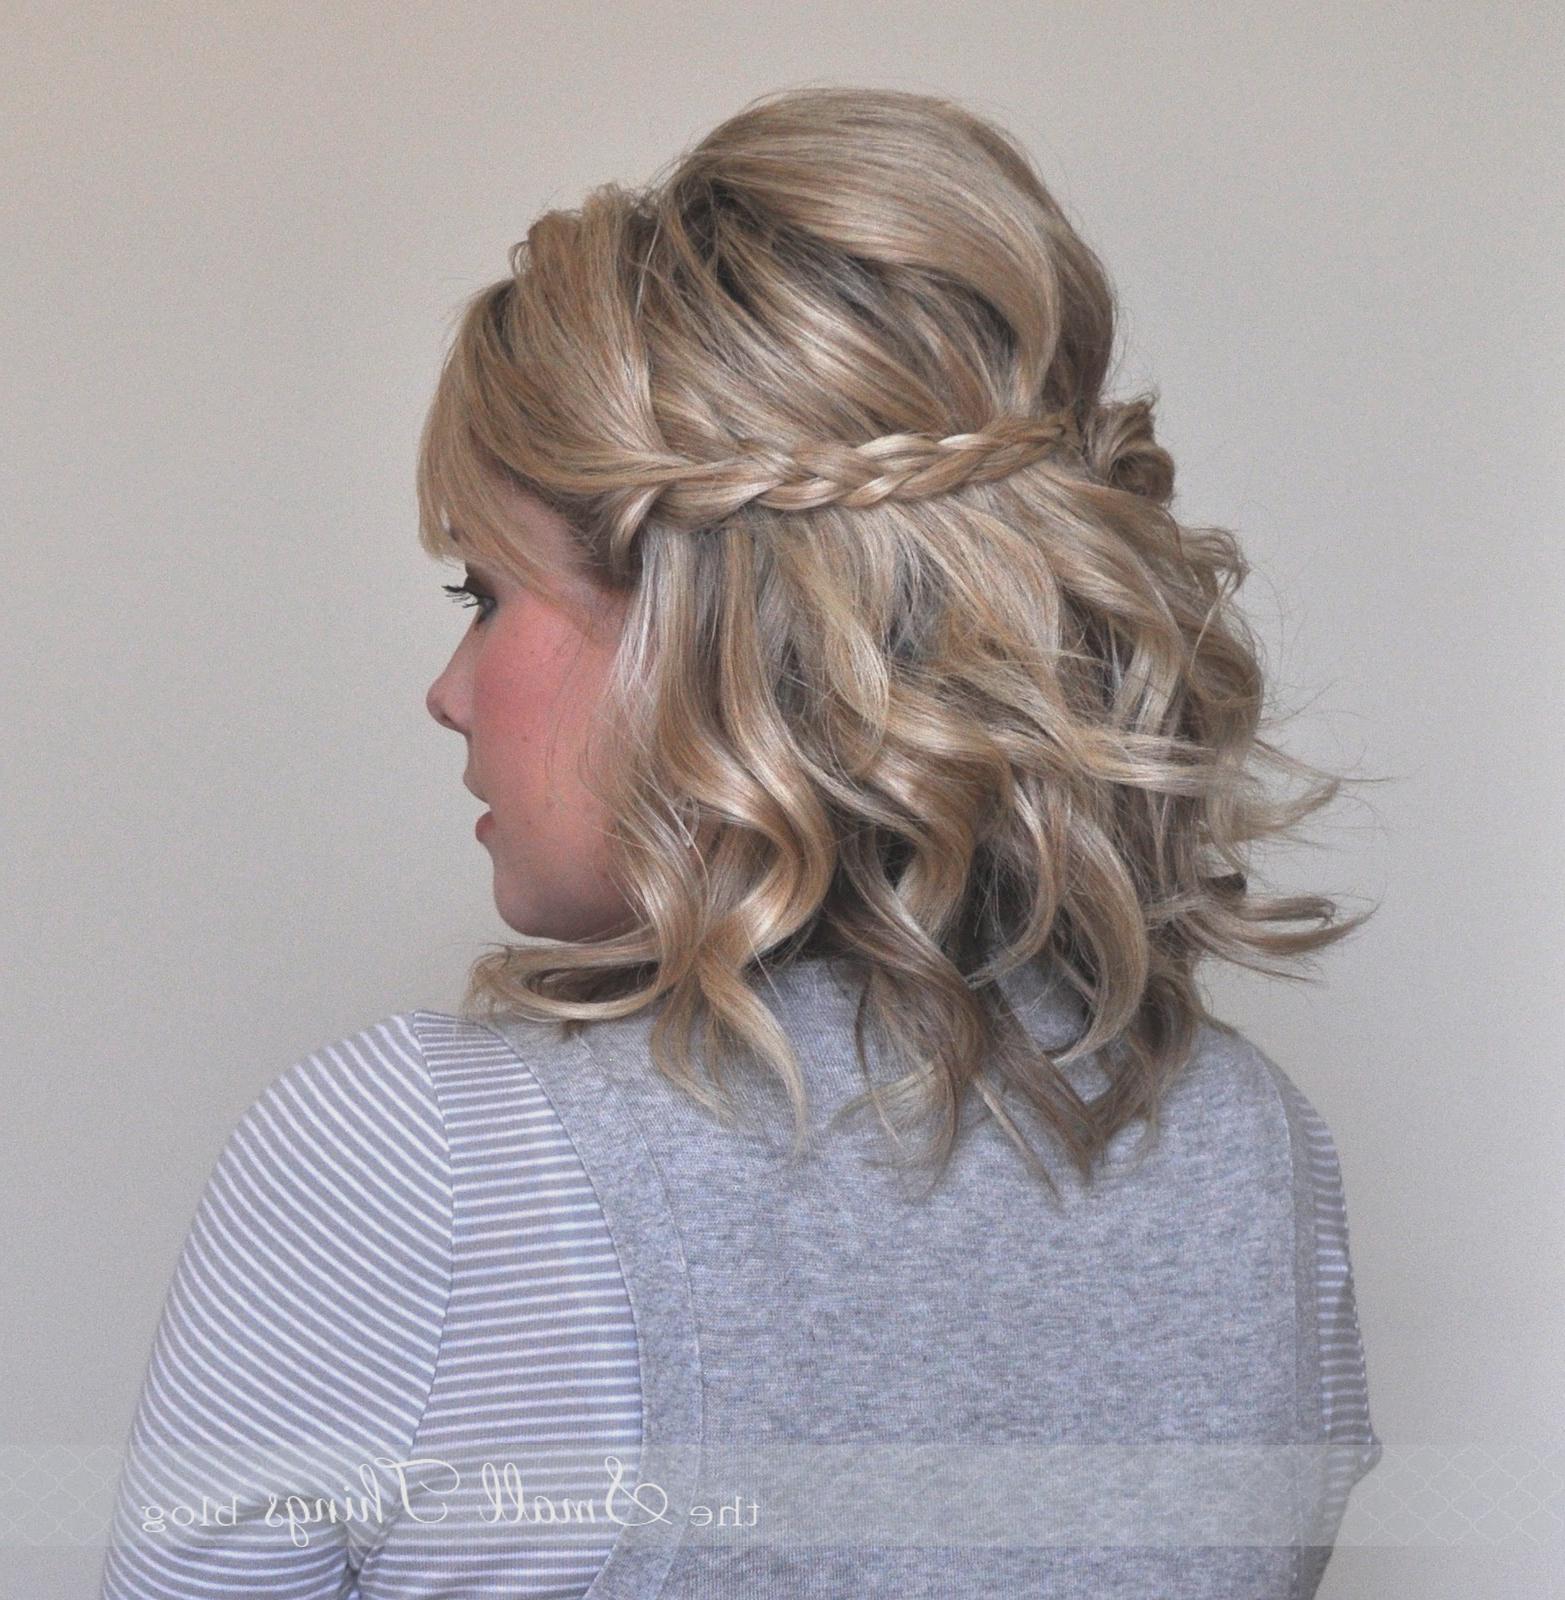 Wedding Hairstyles : Simple Wedding Hairstyles Half Up Short Hair Throughout Preferred Simple Halfdo Wedding Hairstyles For Short Hair (View 17 of 20)